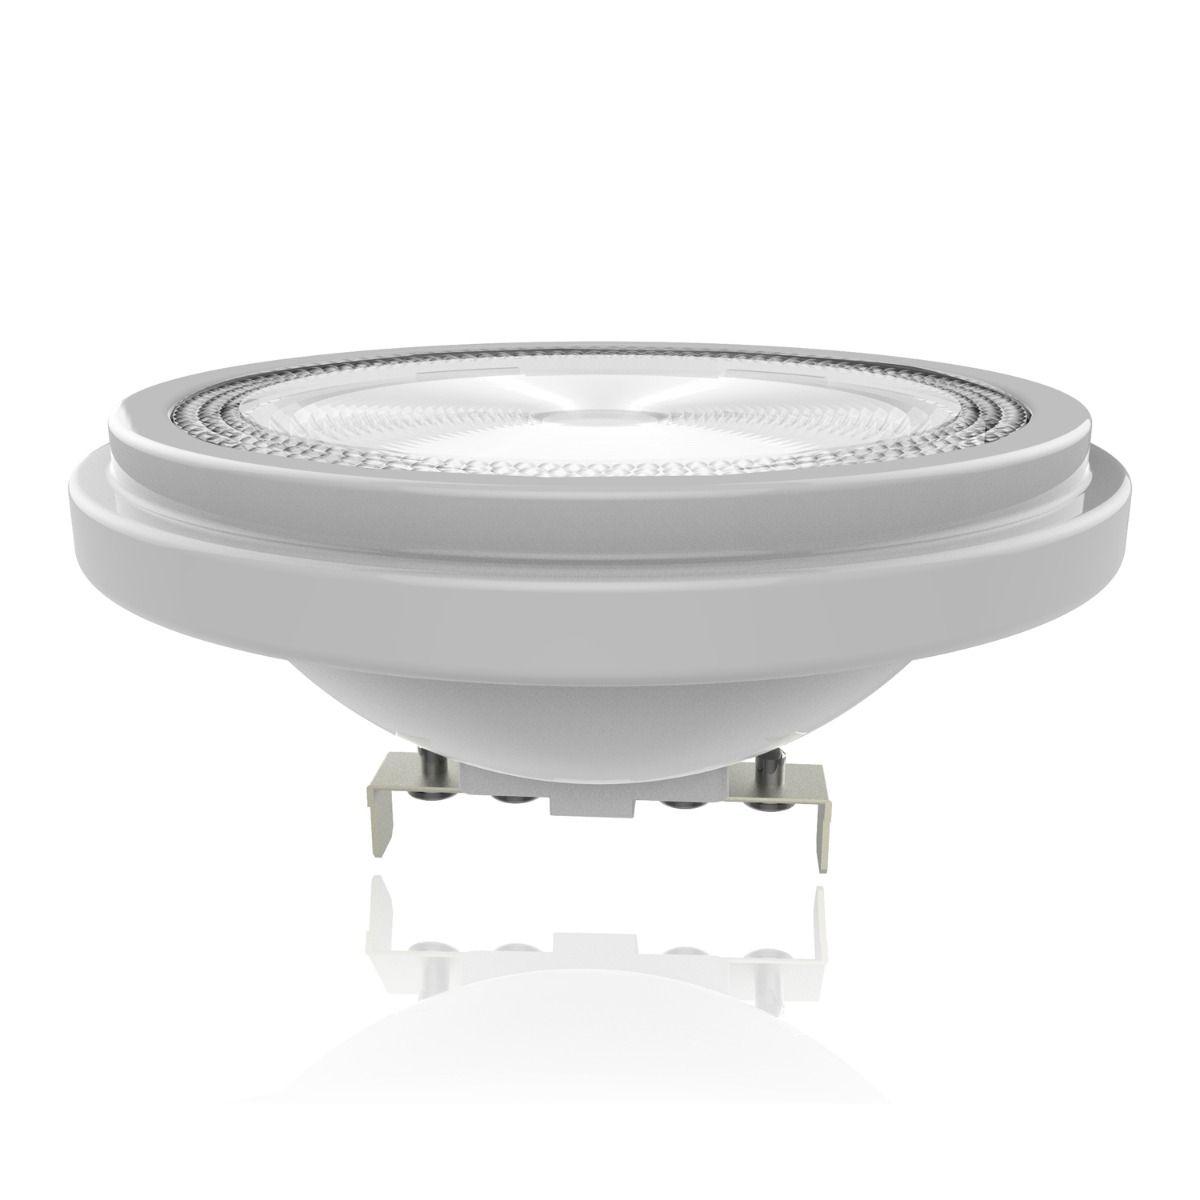 Noxion Lucent LED-Spot AR111 G53 12V 11.5W 927 40D | Dimmbar - Höchste Farbwiedergabe - Ersatz für 75W